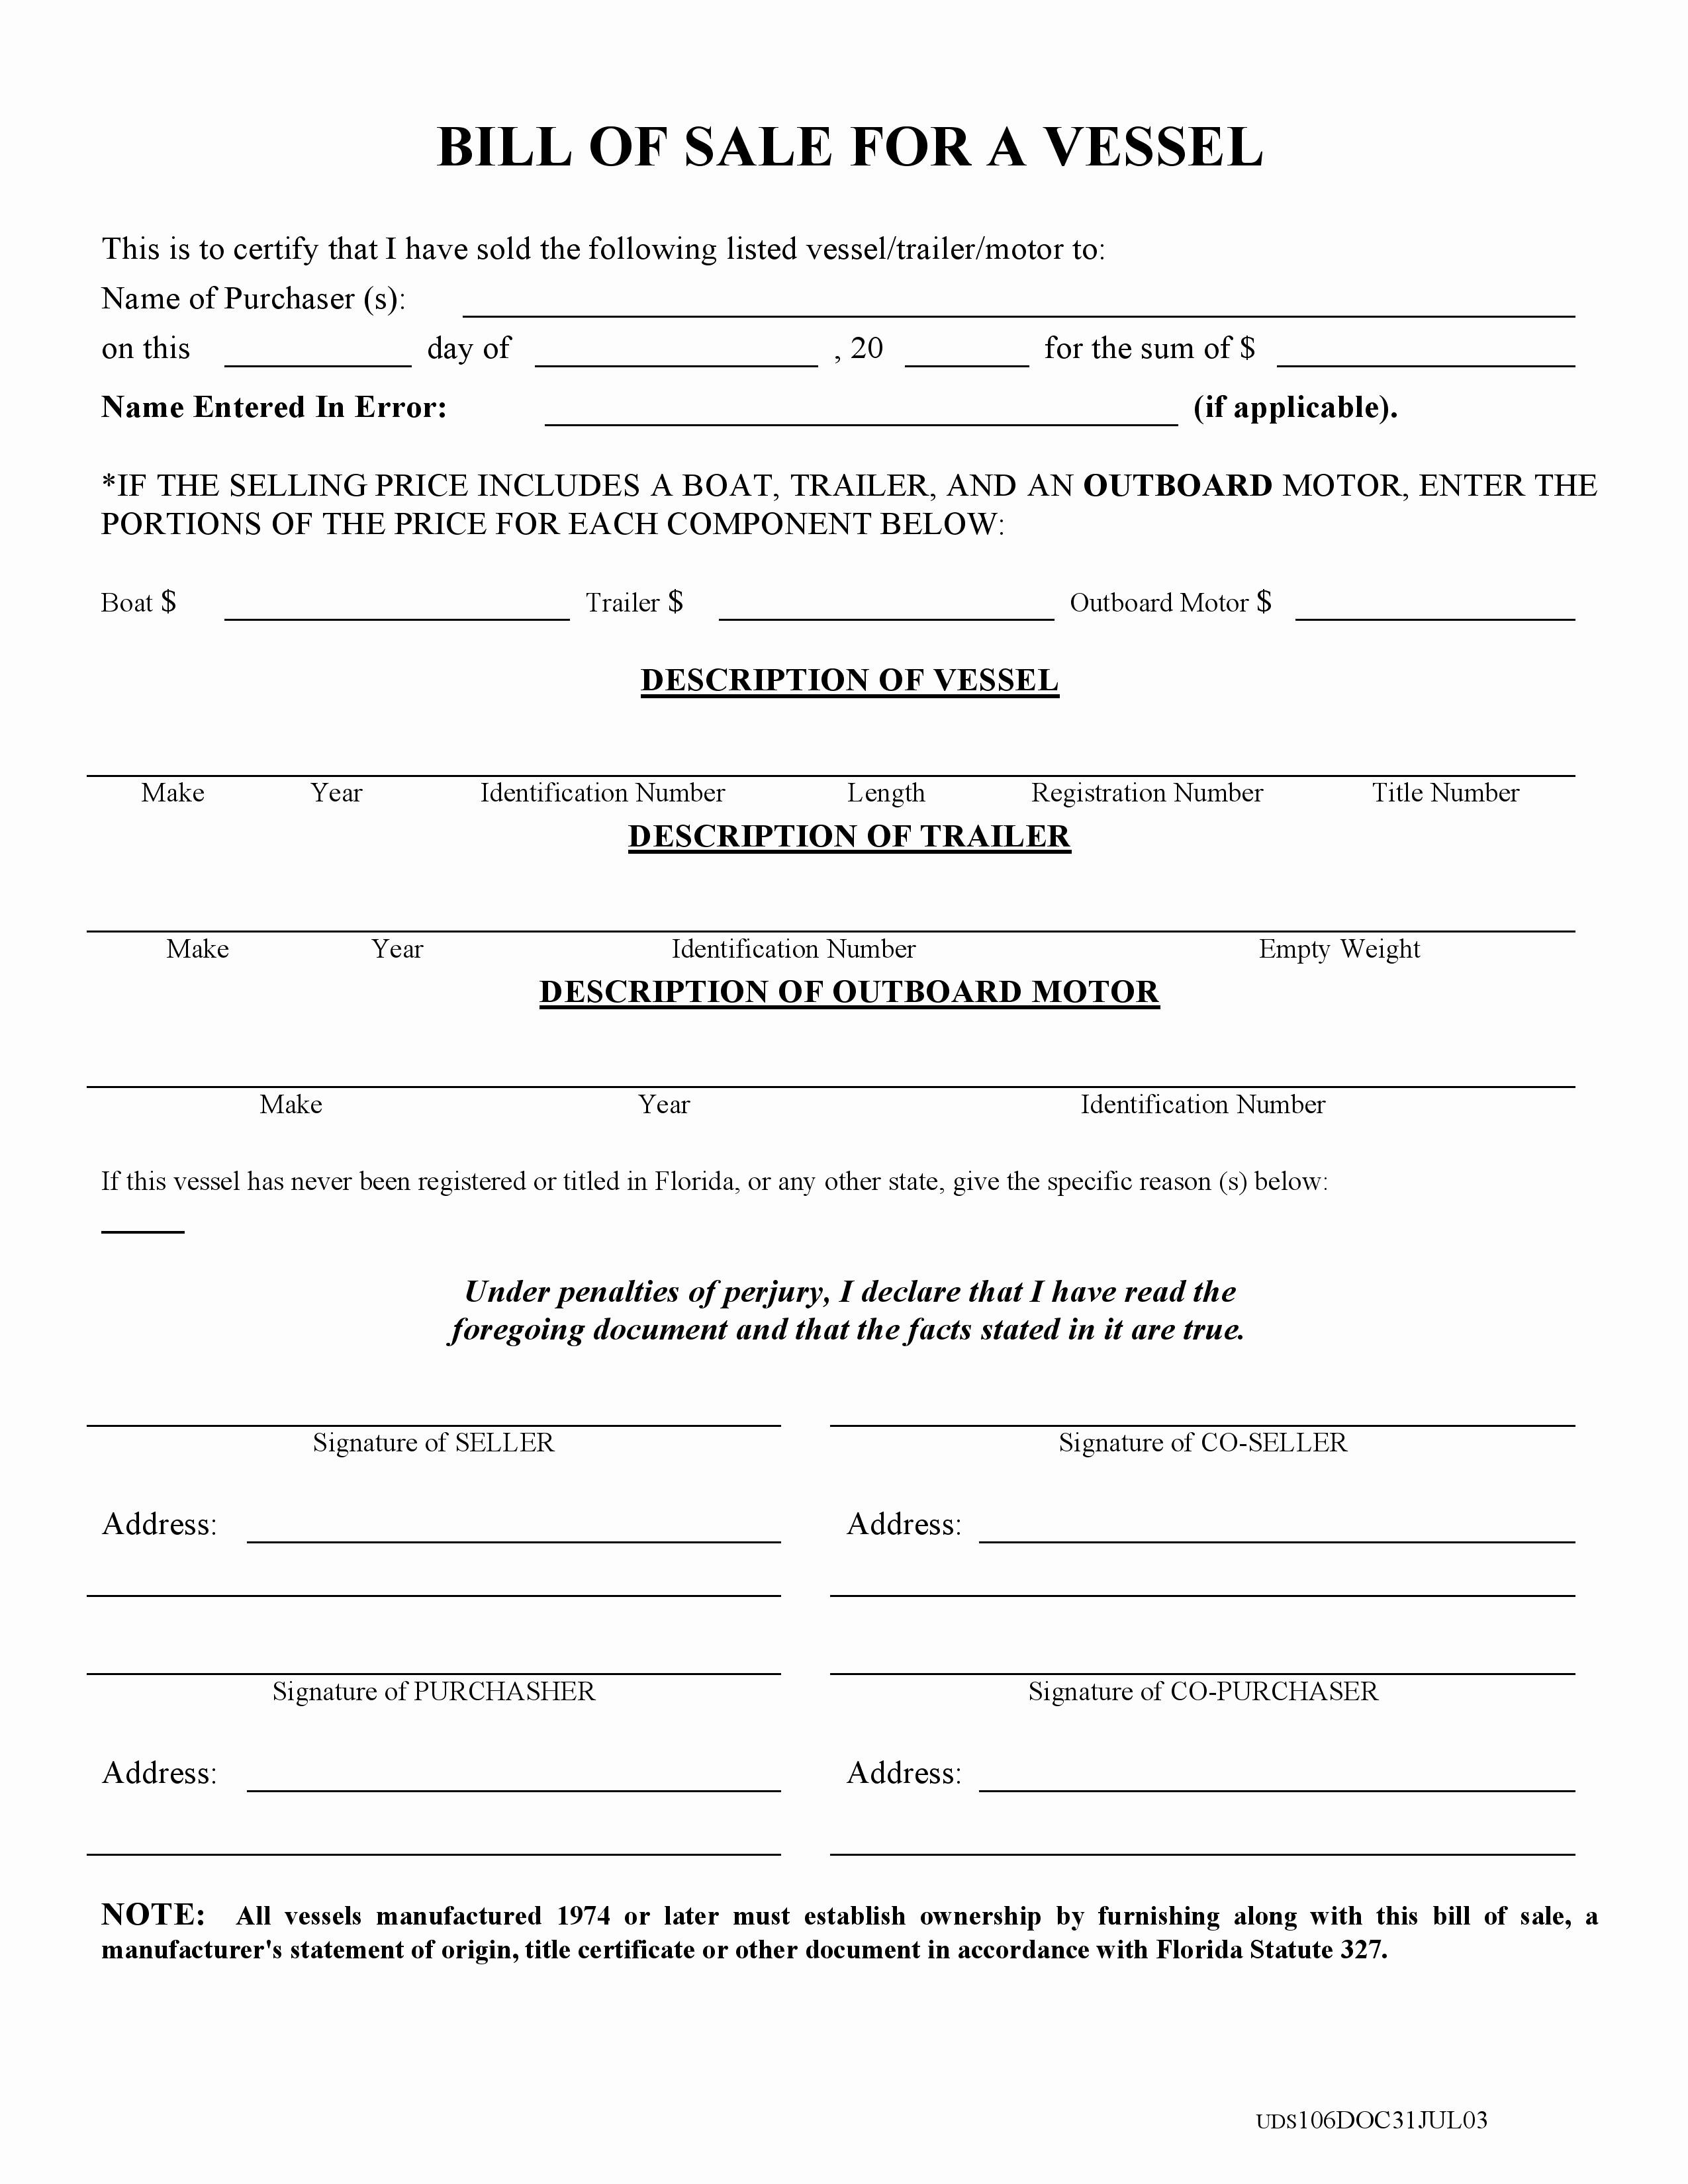 Automotive Bill Of Sale Florida Luxury Free Florida Boat Bill Of Sale form Pdf